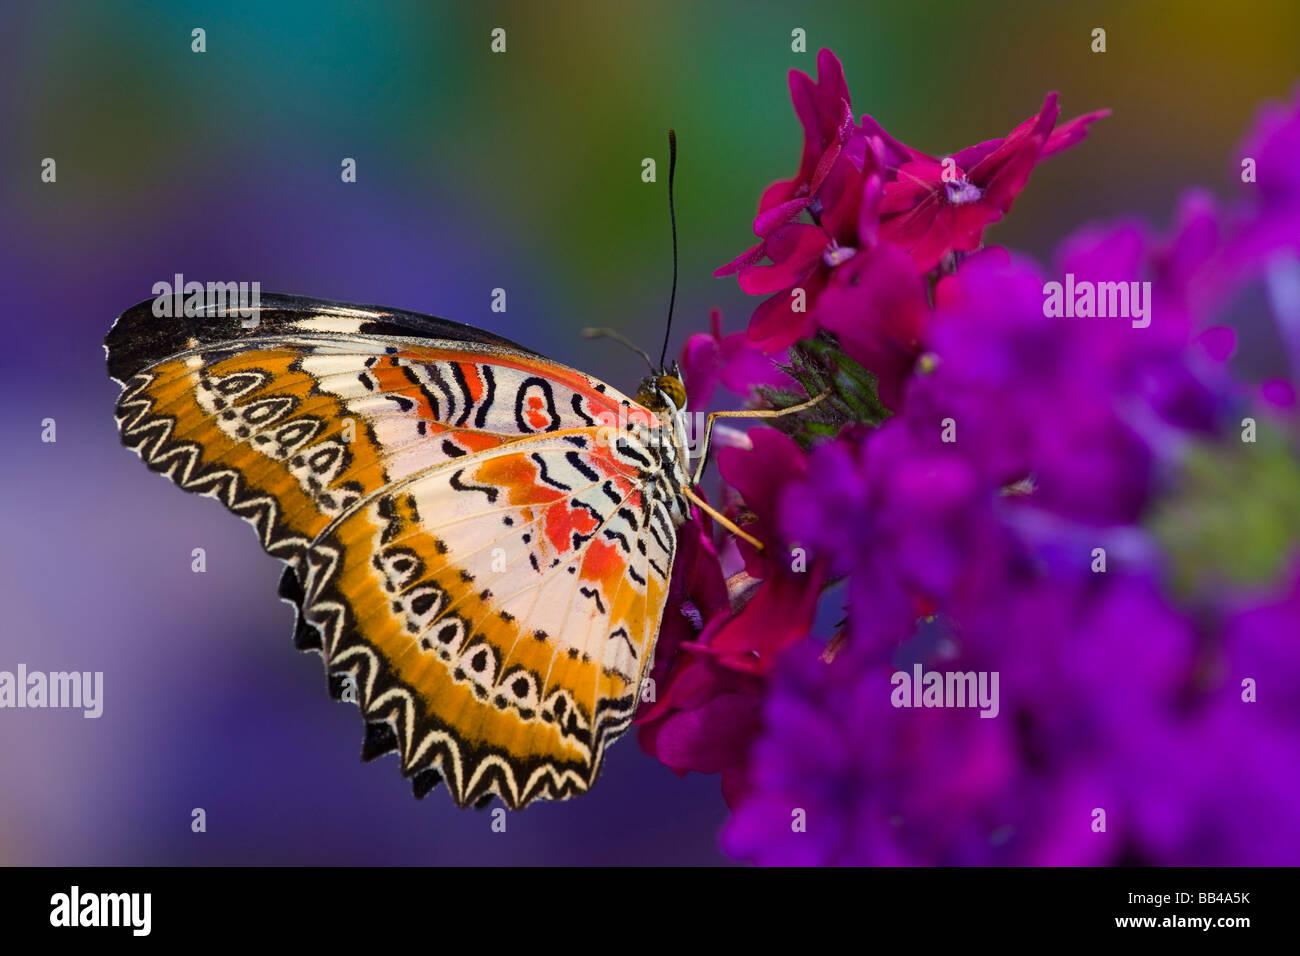 Sammamish Washington farfalle tropicali fotografia Lacewing comune butterfly, Cethosia biblis su verbena Immagini Stock